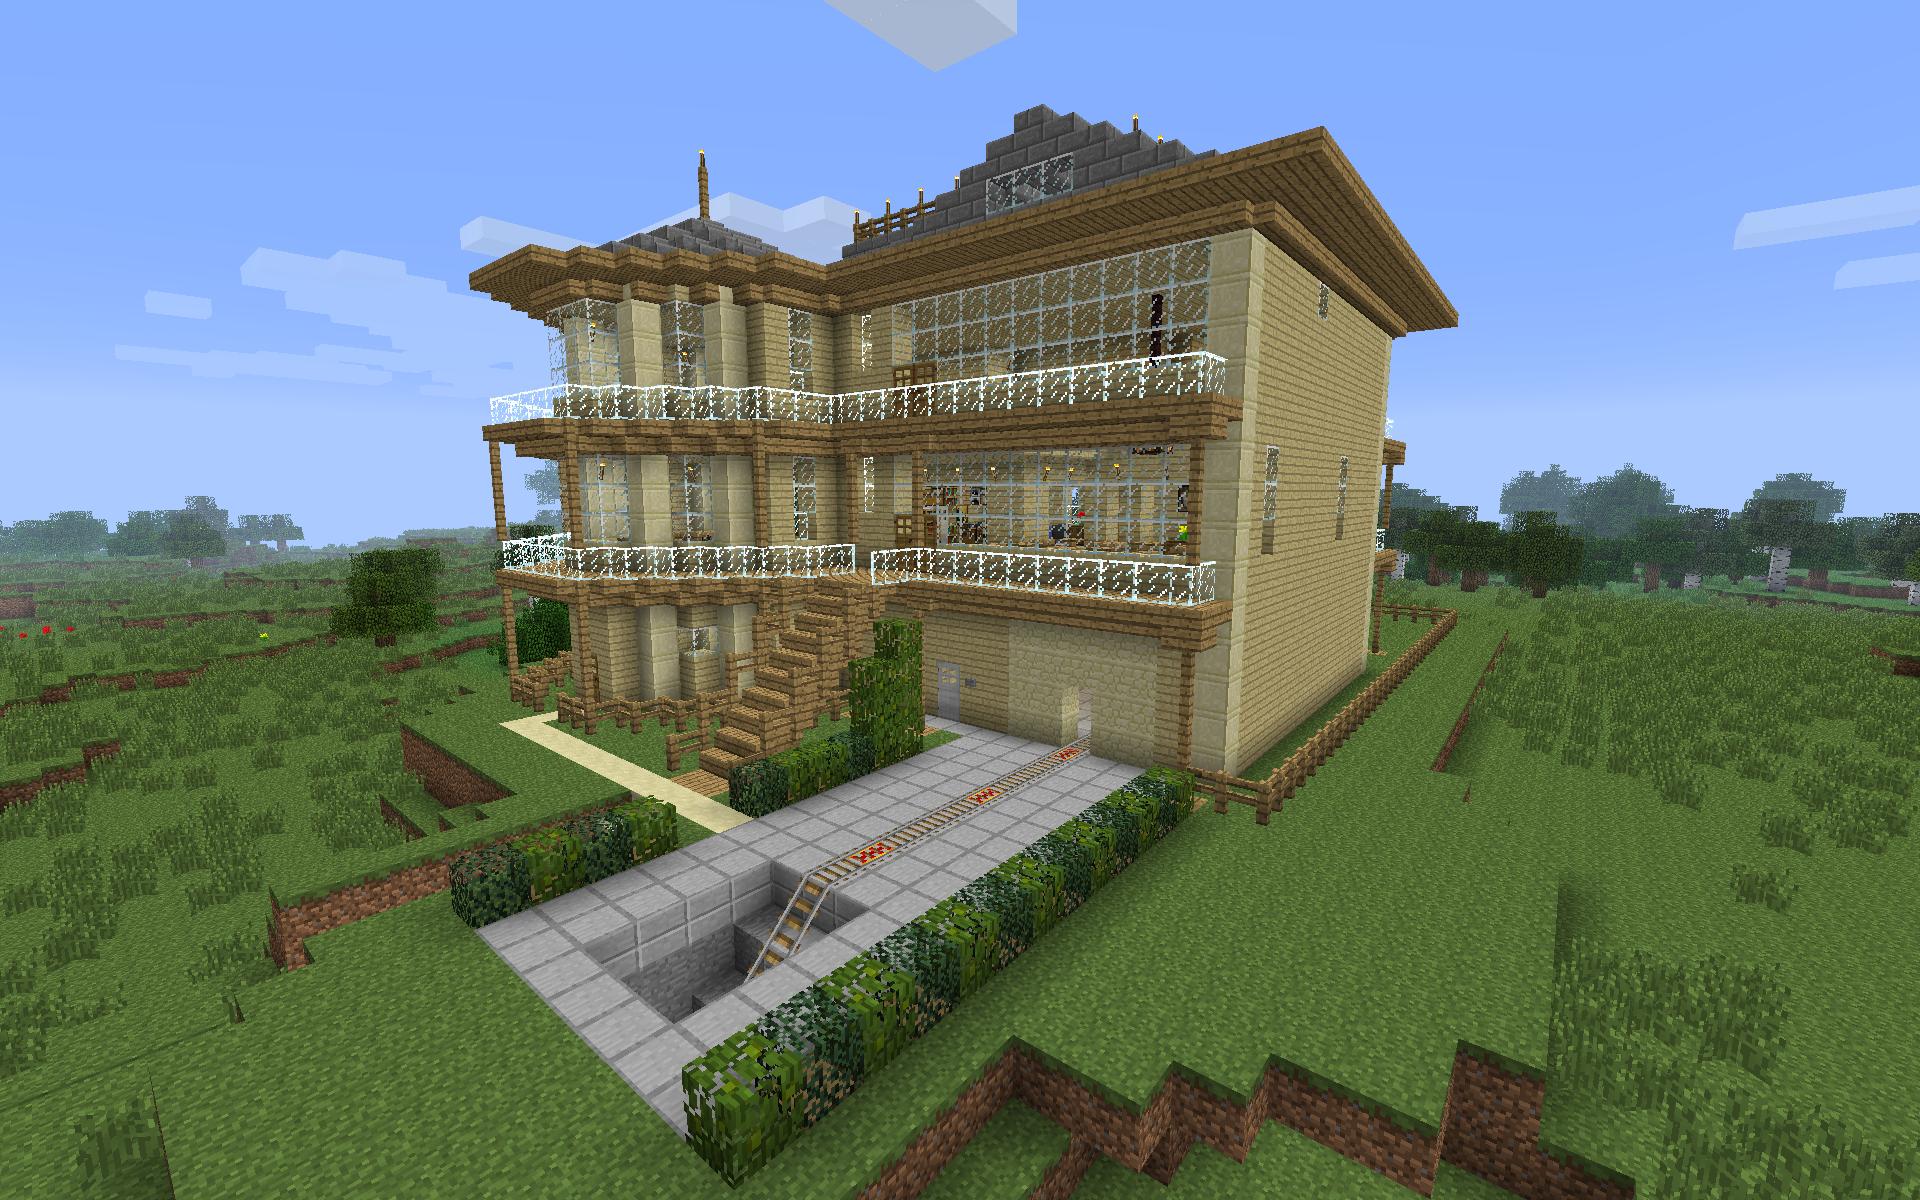 Best minecraft house blueprints villa seeds images also rh hu pinterest